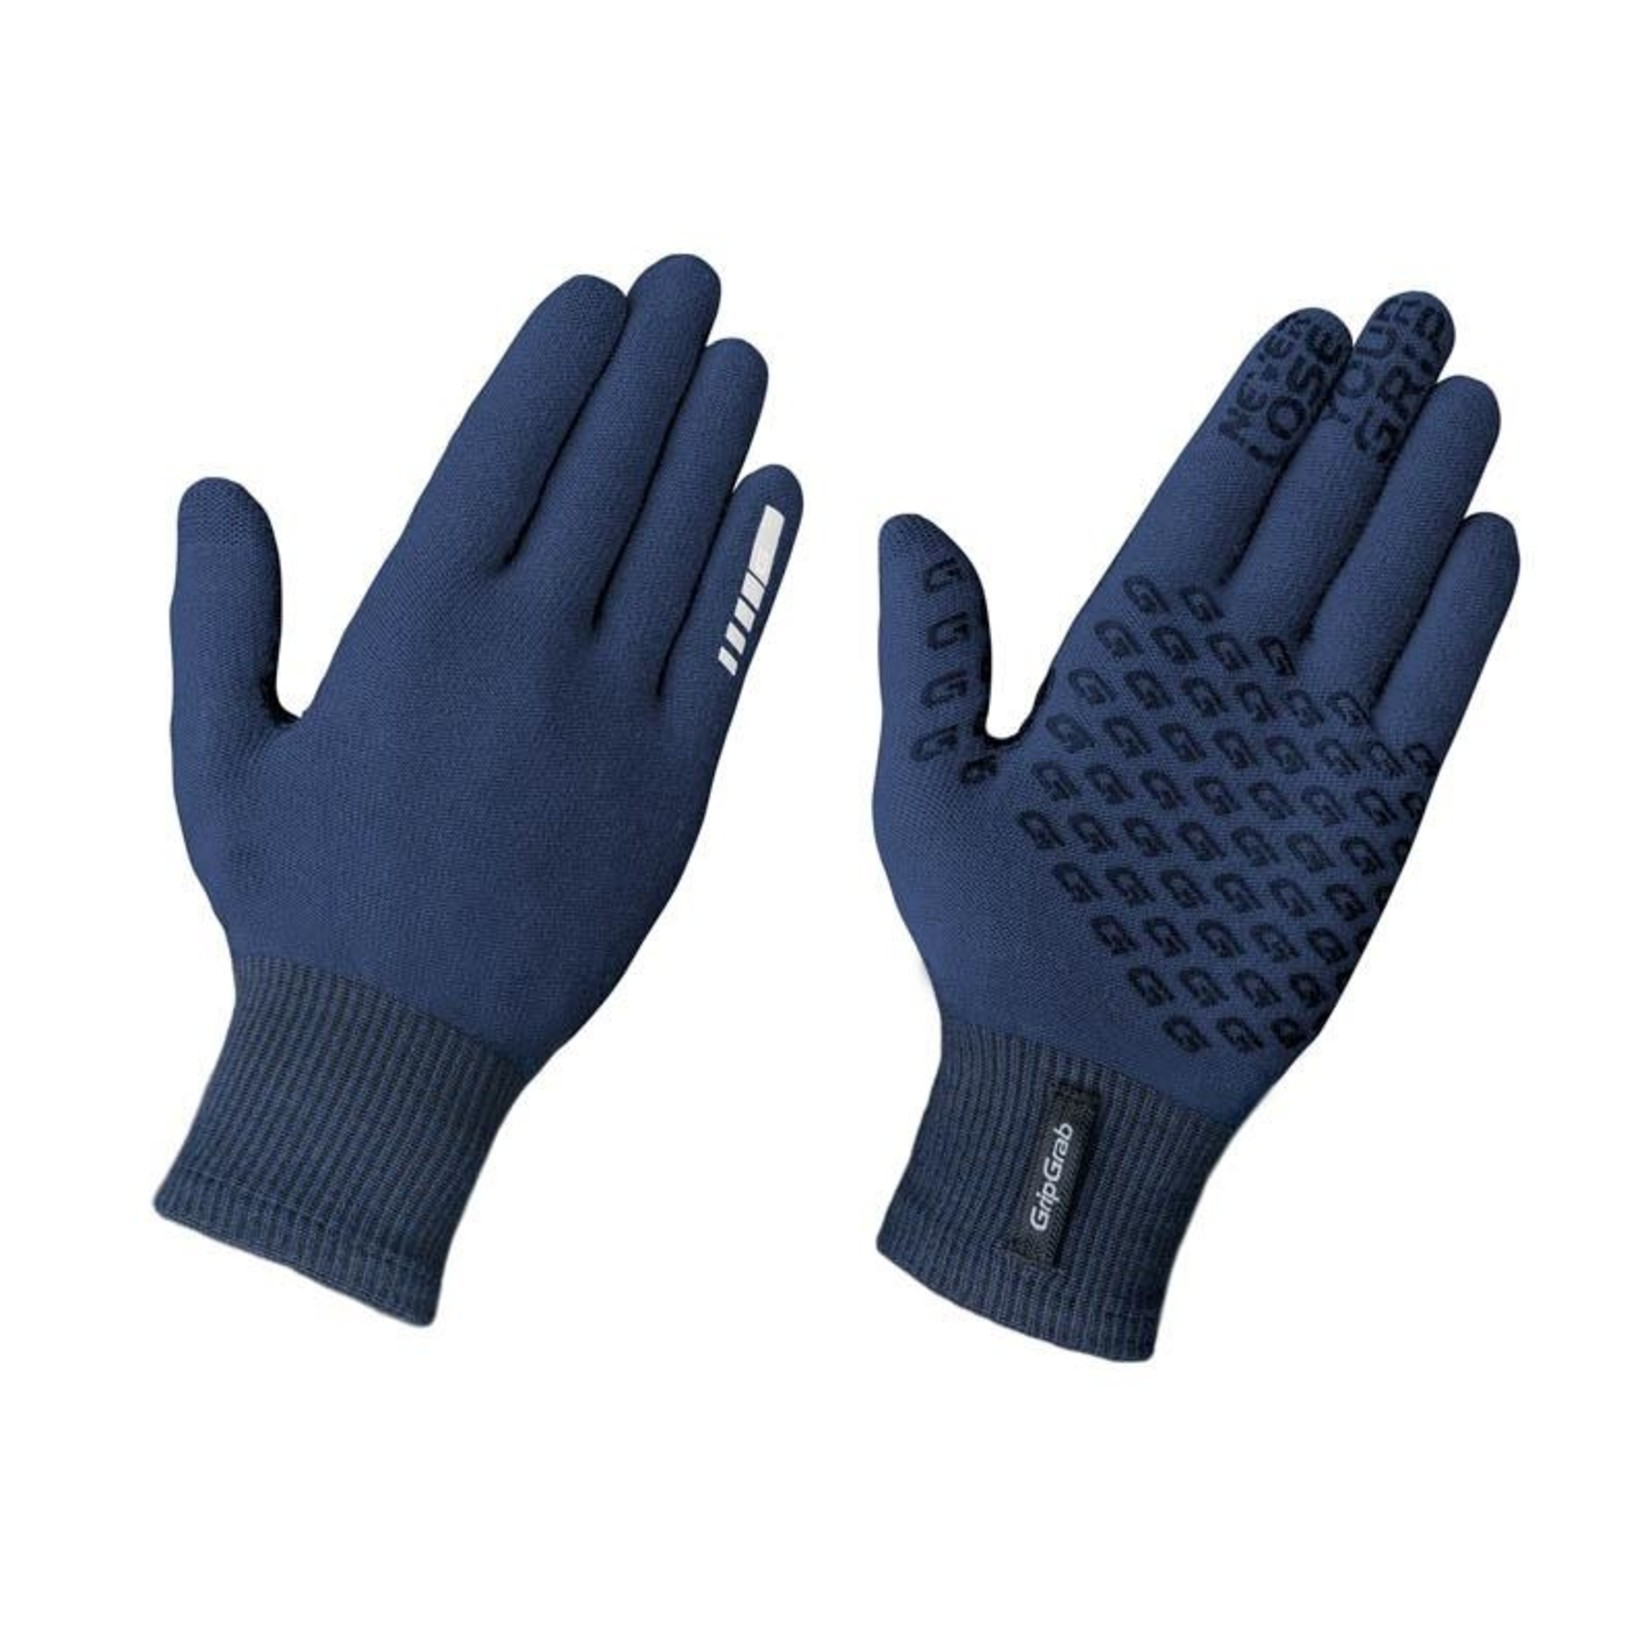 GripGrab GripGrab Primavera Merino Midseason Gloves II